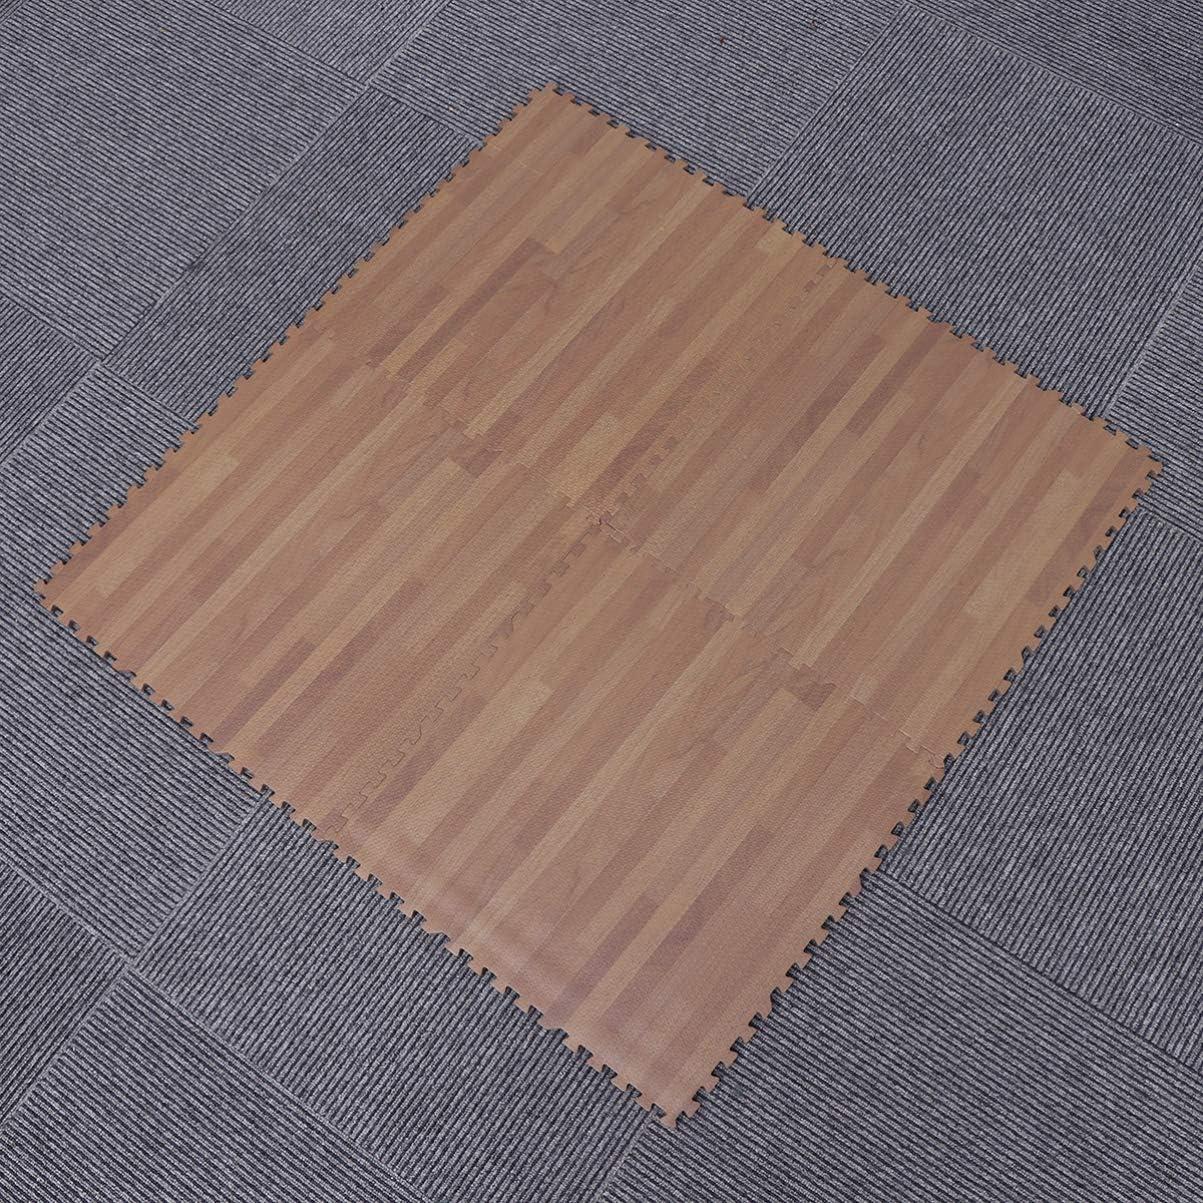 BESPORTBLE 4pcs 30x30cm Kids Puzzle Mat Floor Interlocking Soft Carpet Square Foam Sports Yoga Cushion Jigsaw Mat Gift for Home Rose Red Pink